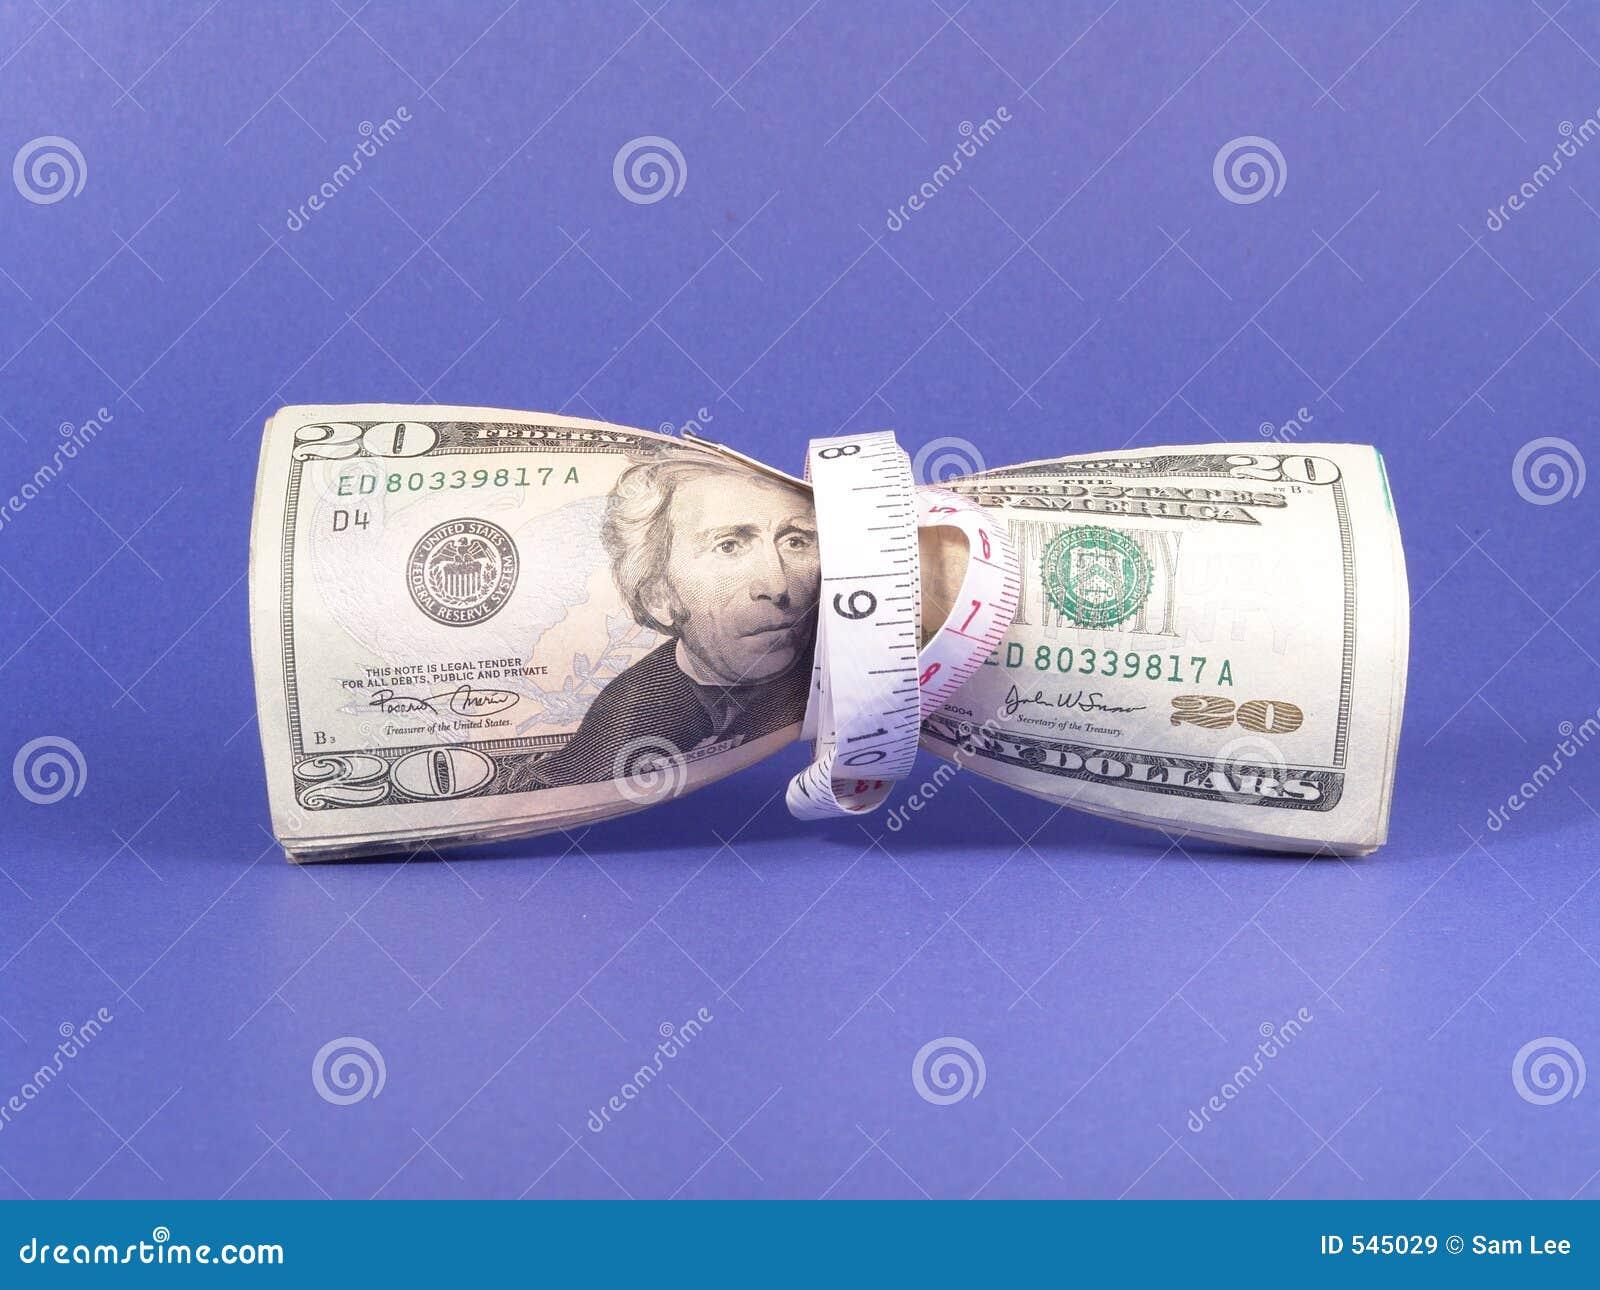 Download 预算值通货膨胀拉紧 库存图片. 图片 包括有 胡言乱语的, 英寸, 领导, 投资, 管理, 商务, 市场, 报废 - 545029